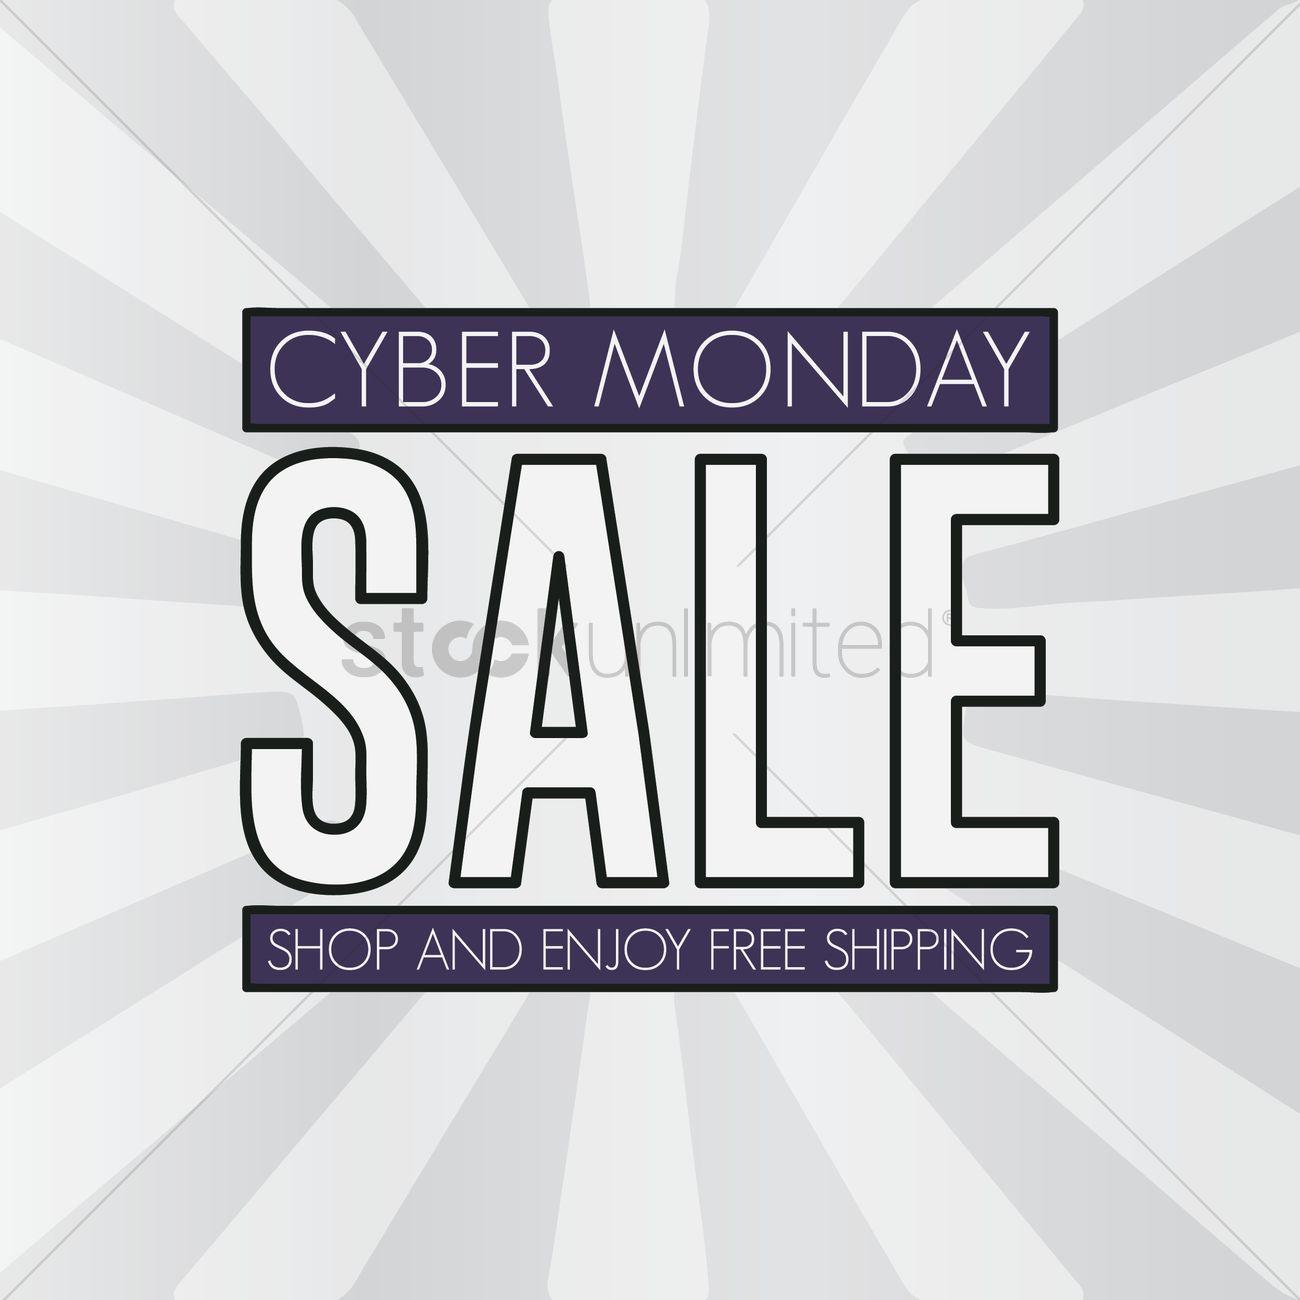 Cyber monday sale wallpaper vector image 1613189 - Monday wallpaper ...